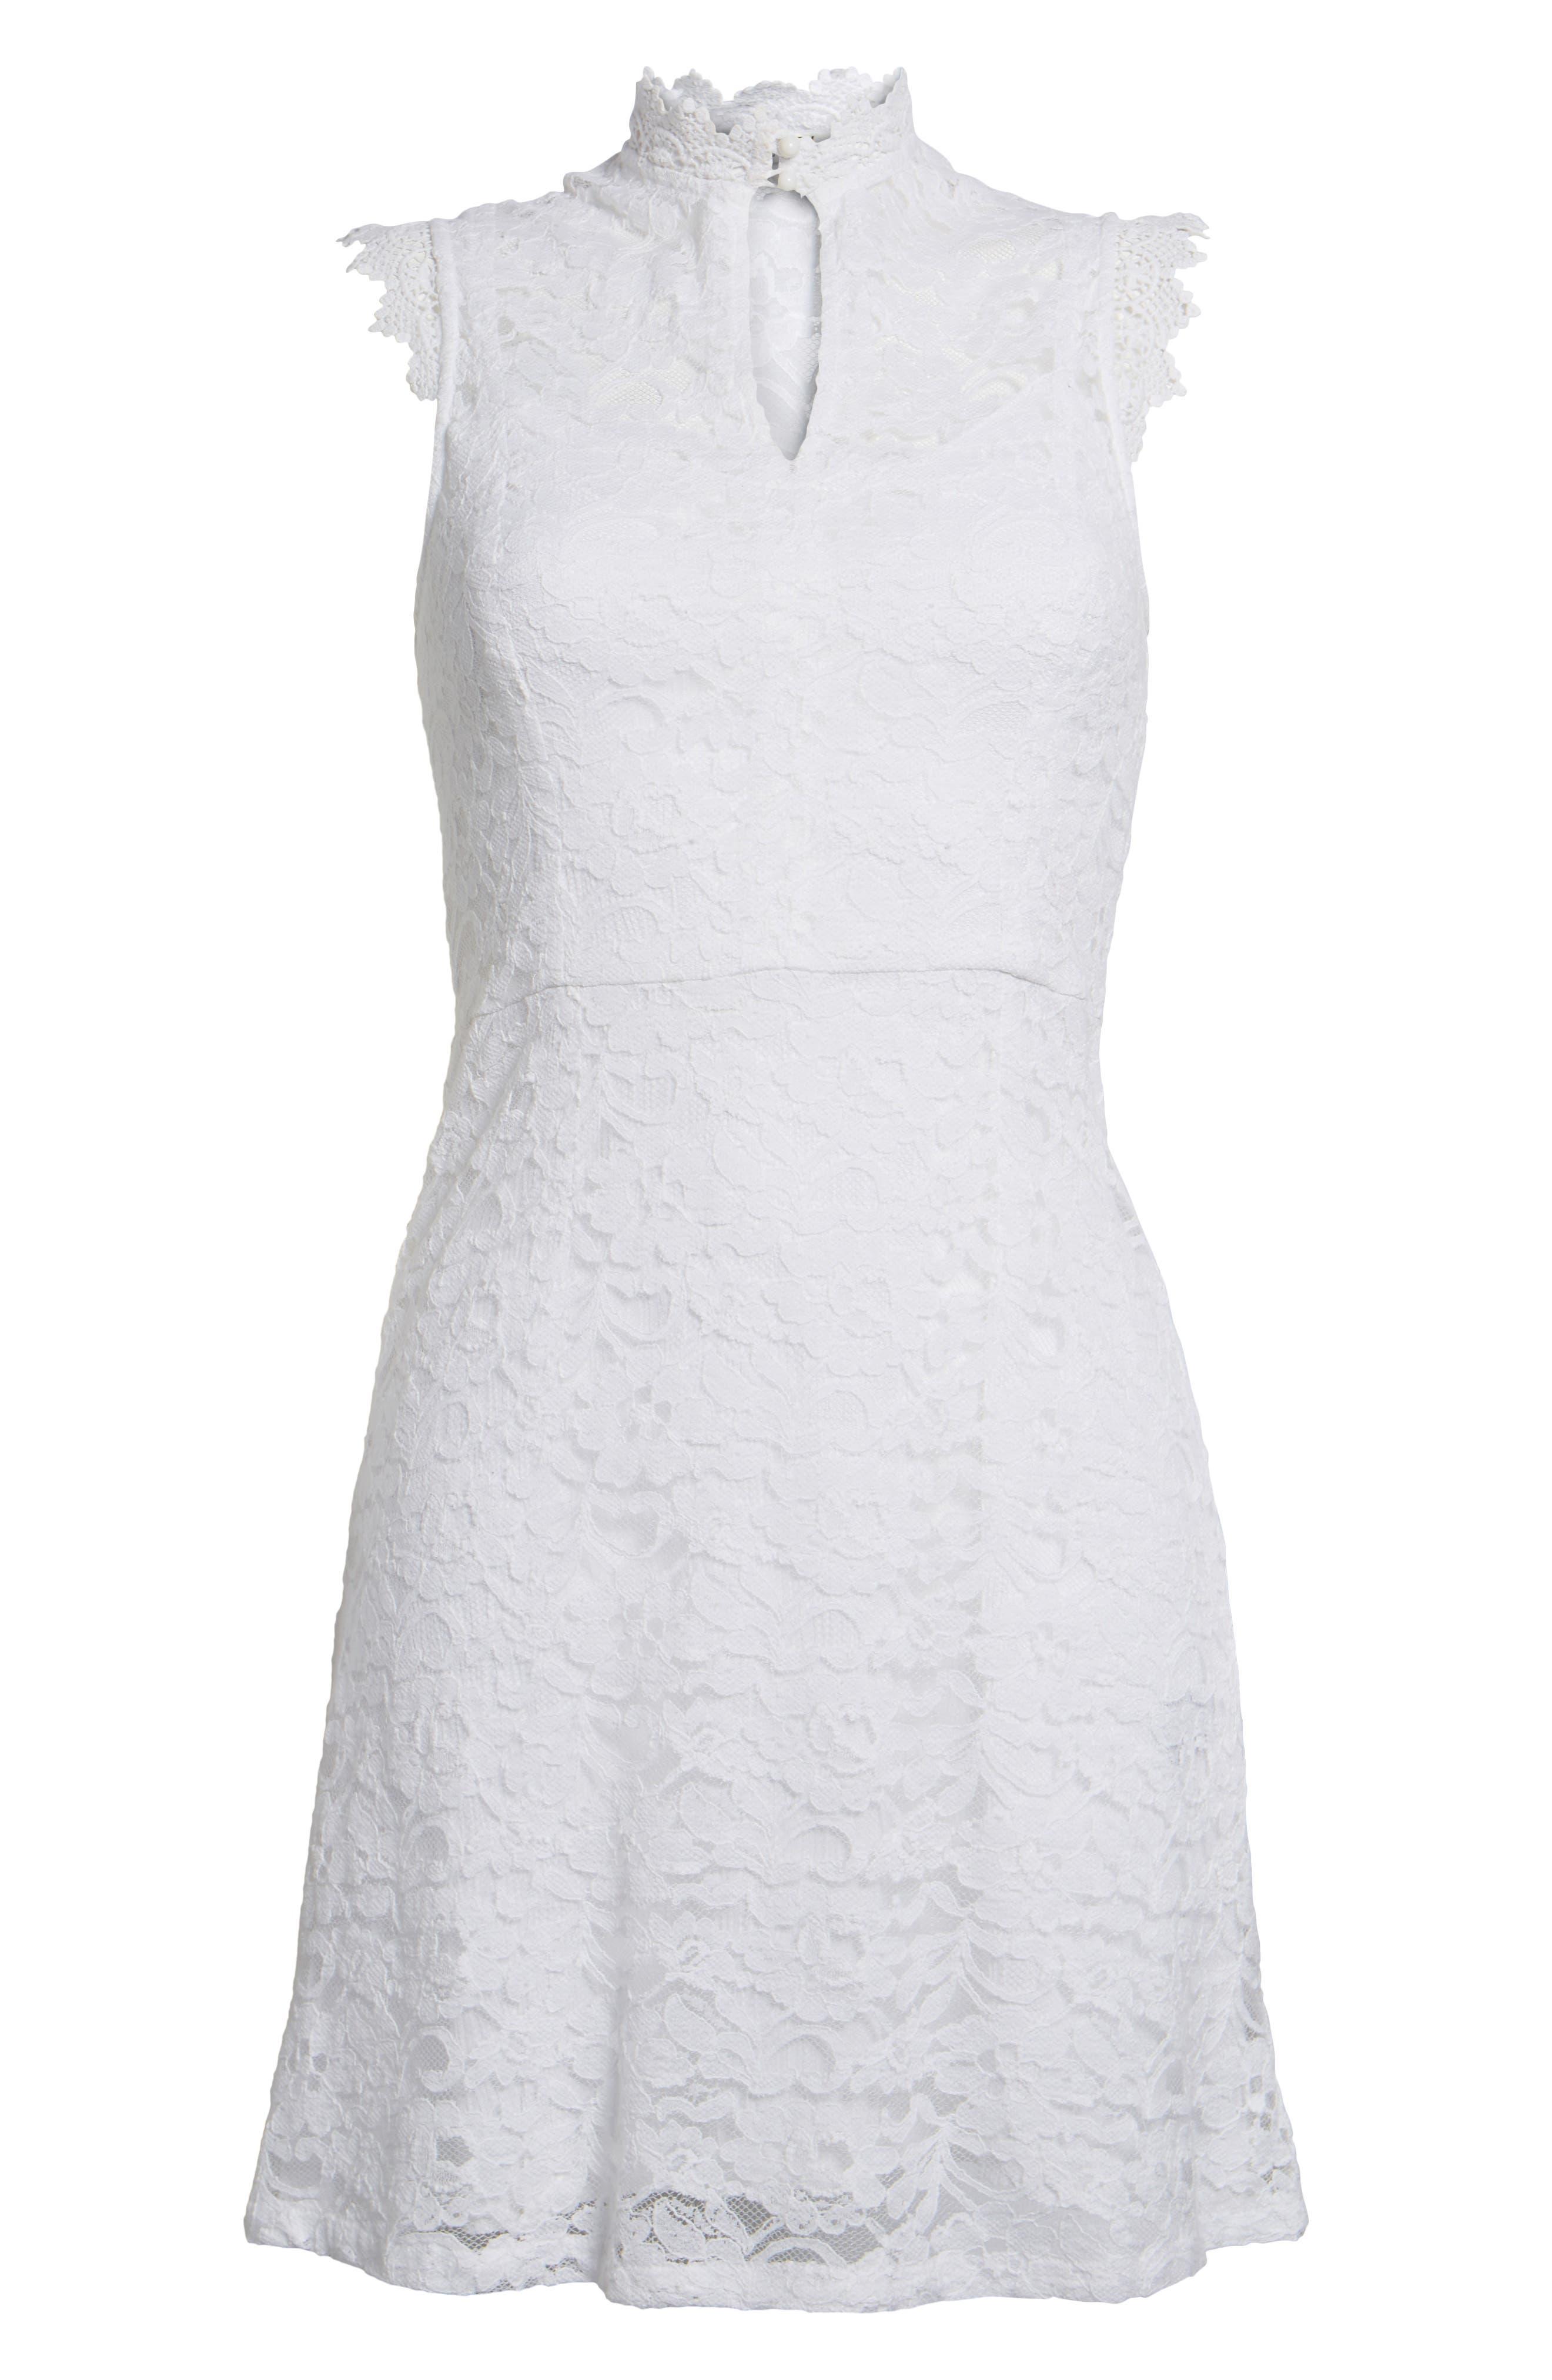 Rapture Lace Keyhole Dress,                             Alternate thumbnail 6, color,                             White